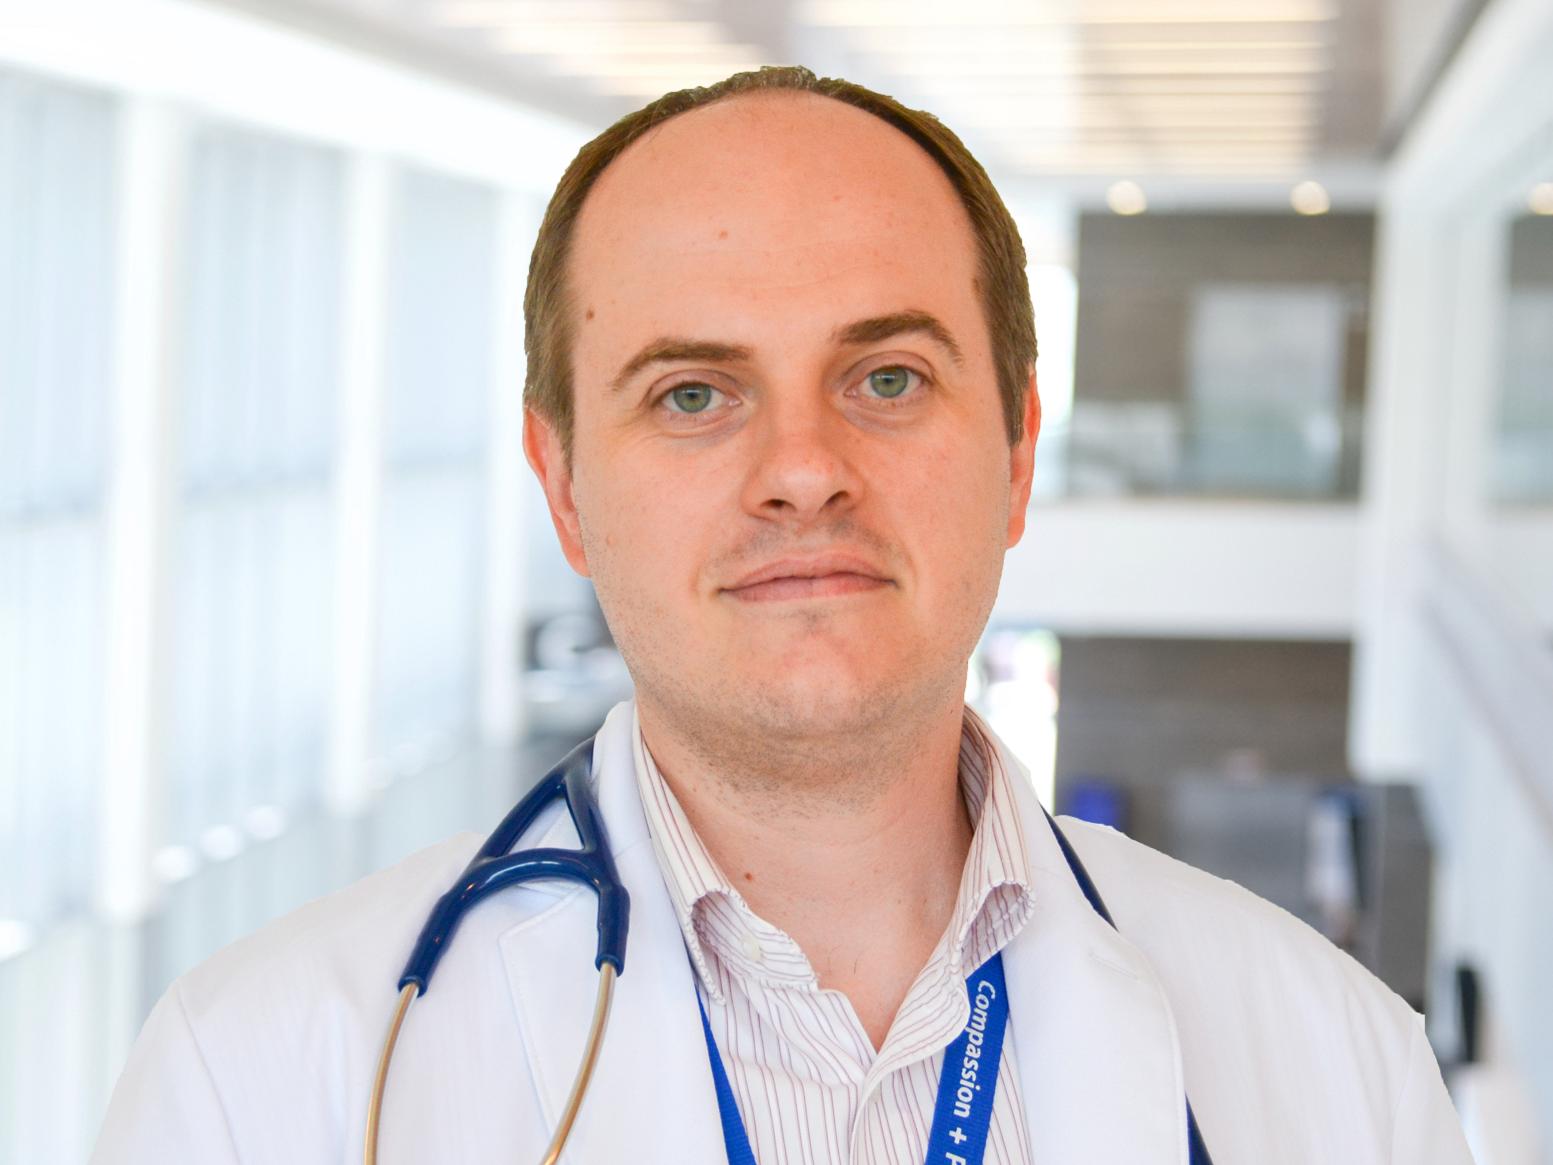 Dr. Paul Szmitko